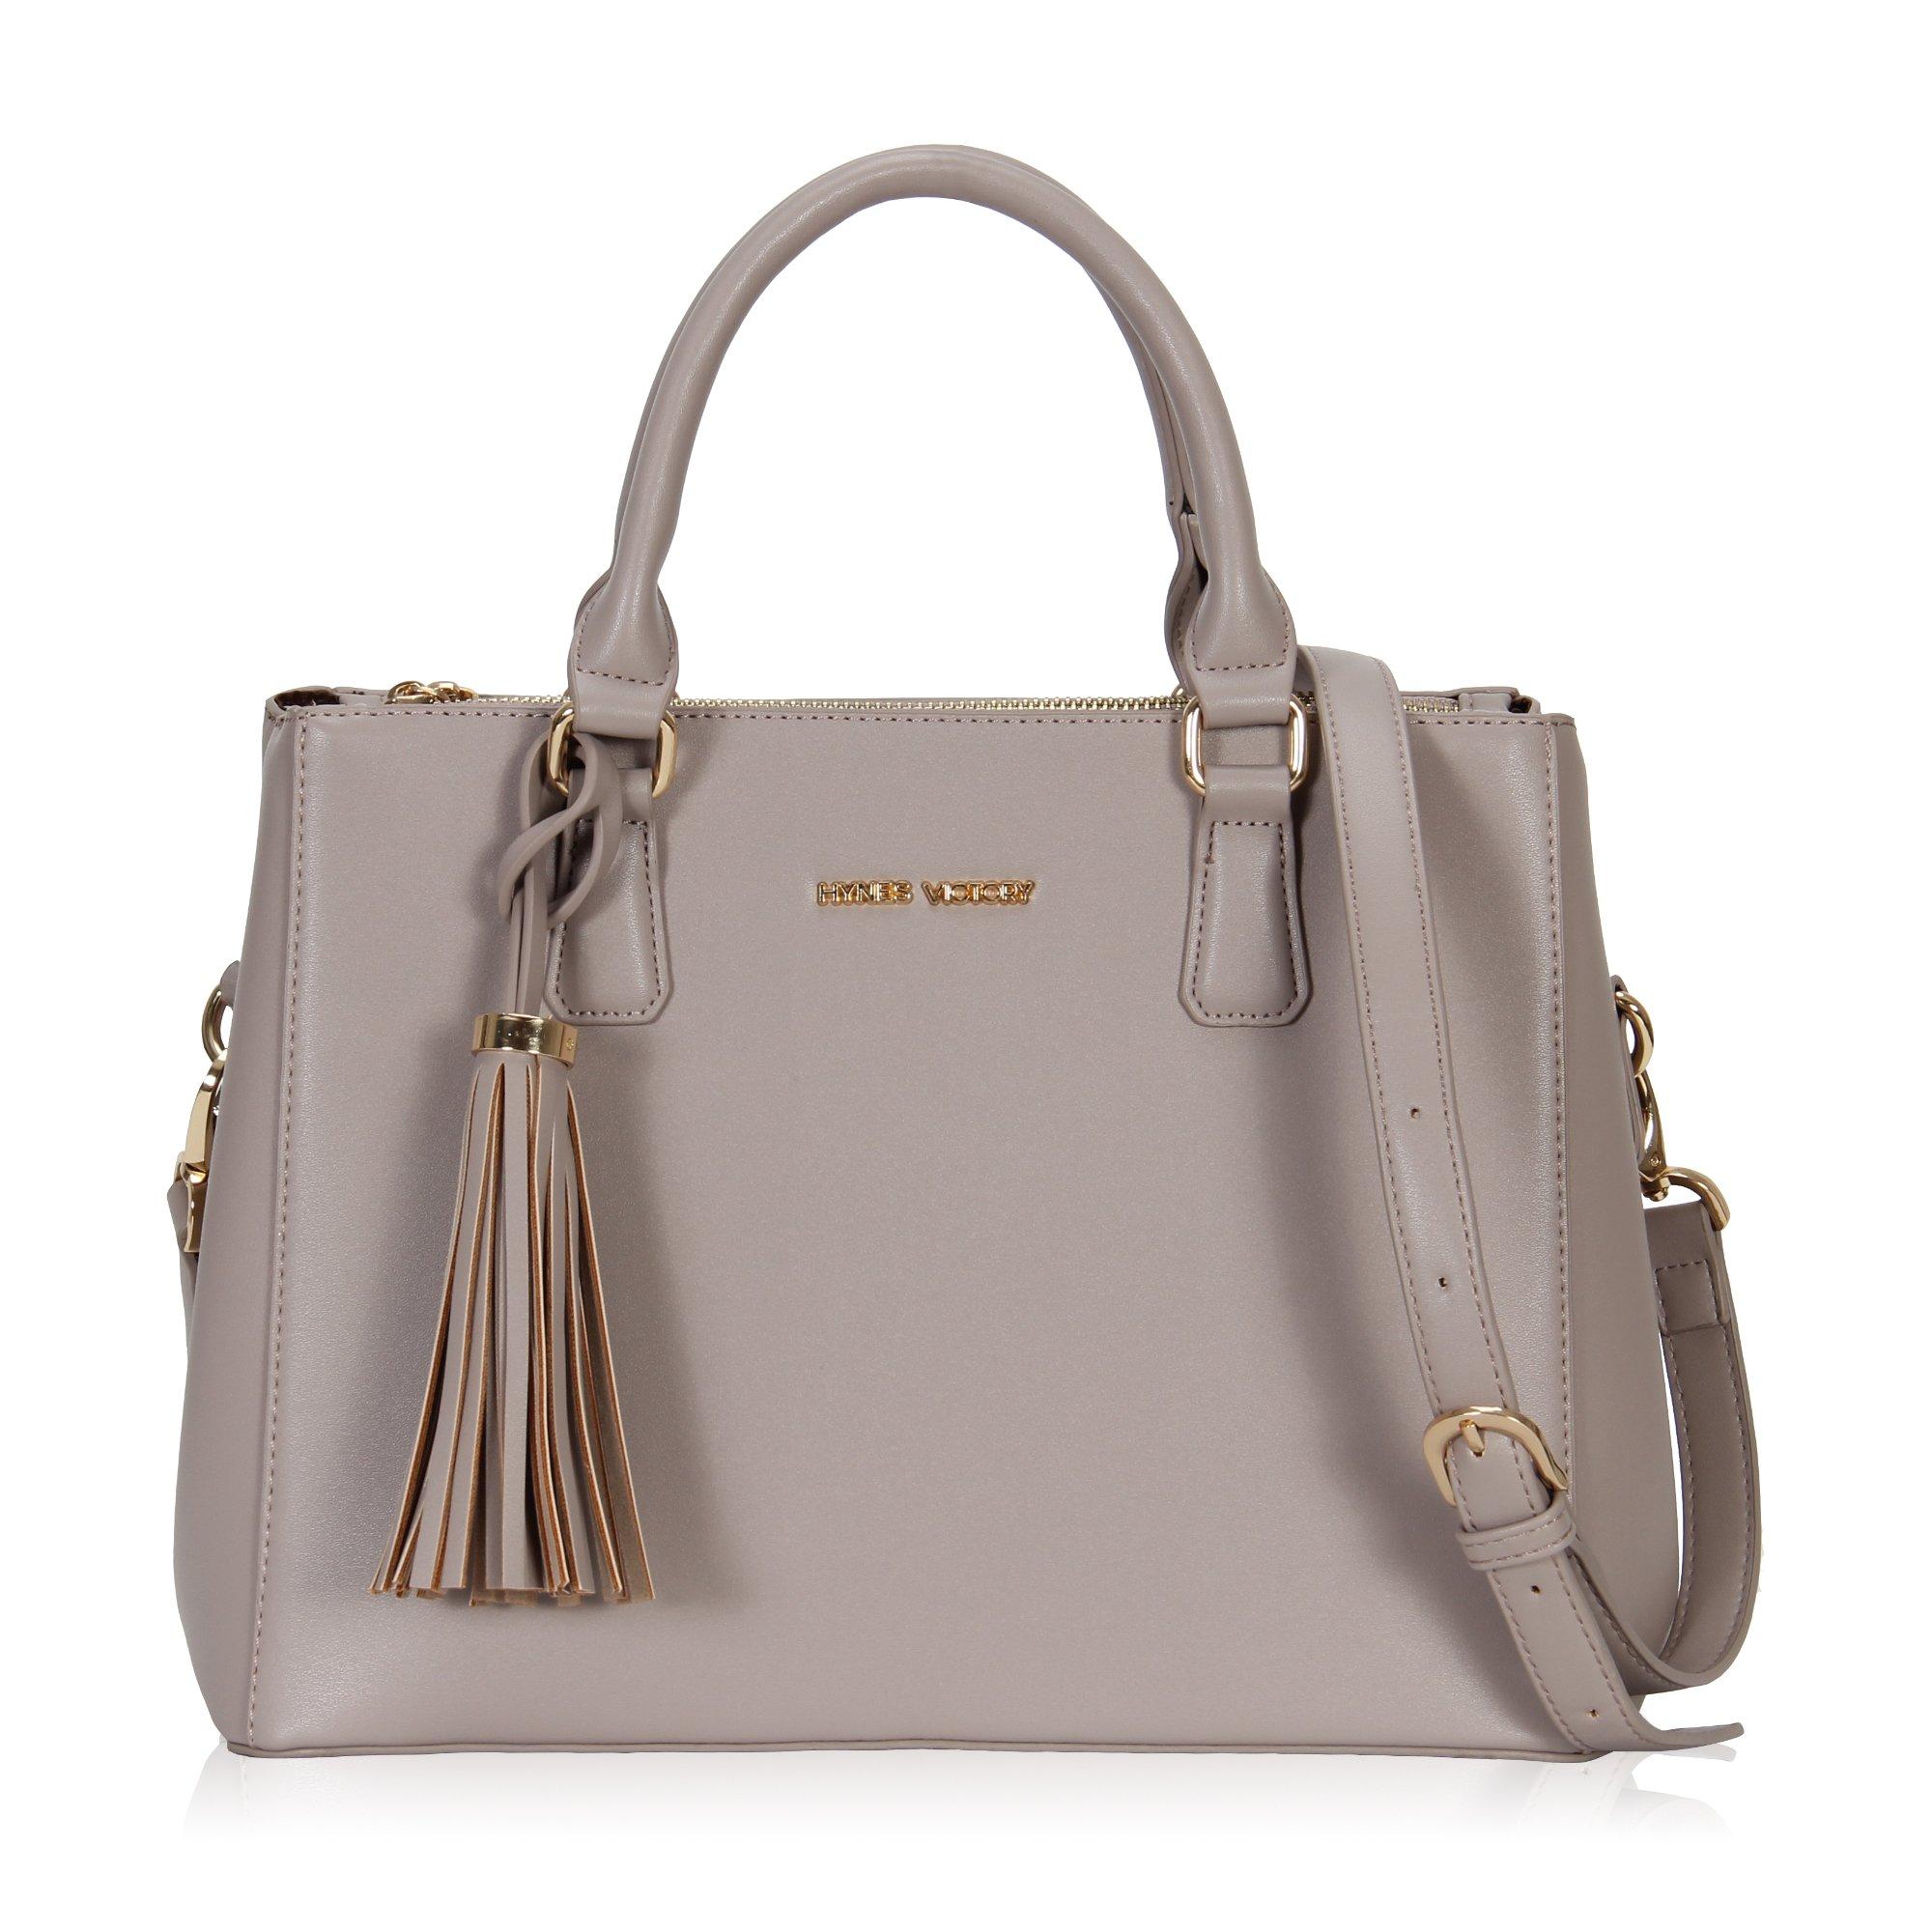 Hynes Victory Womens Classy Satchel Handbag Griege with tassel